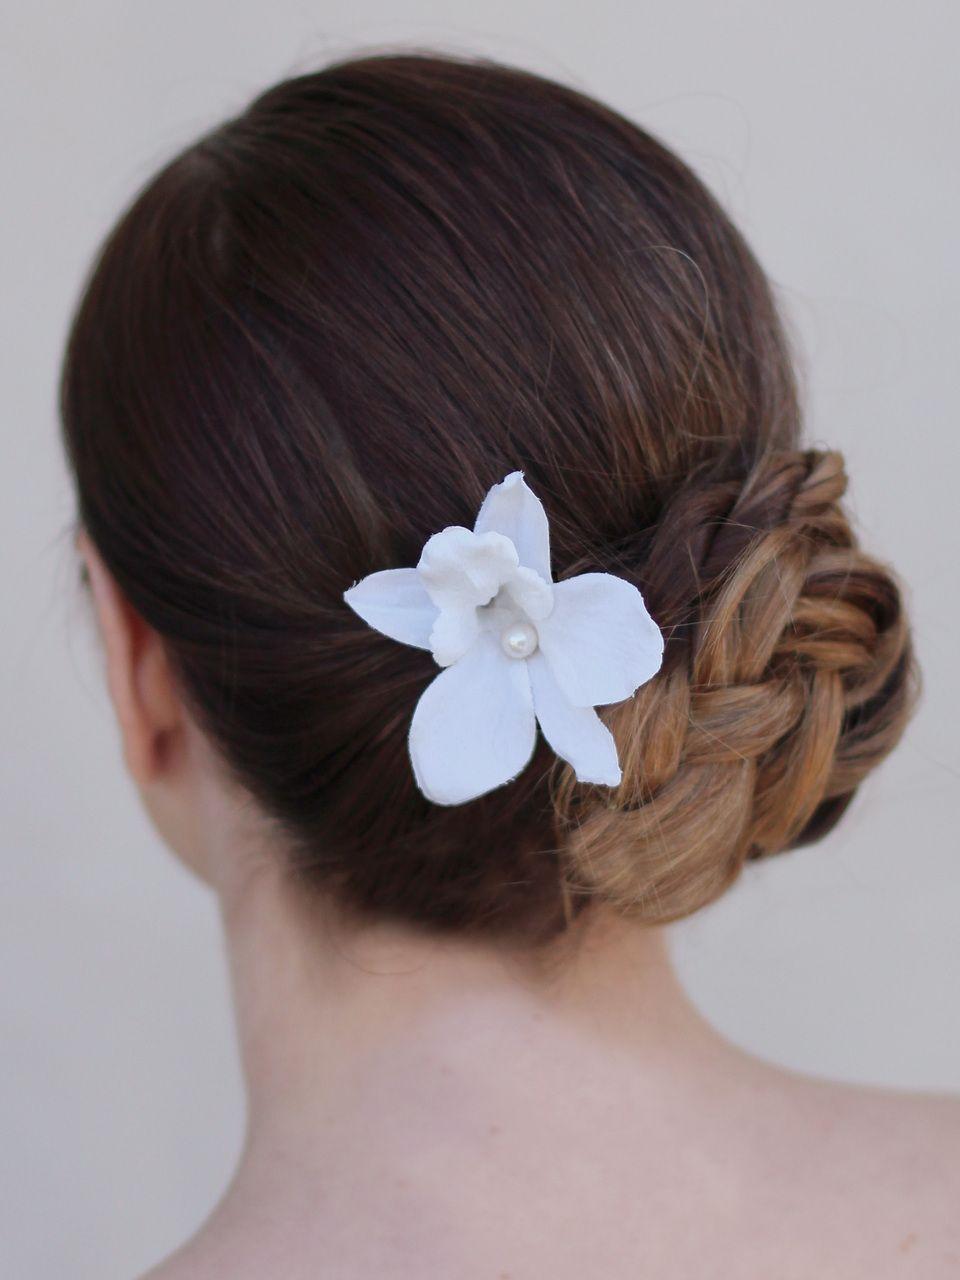 Dendrobium Orchid Hair Pin Blue Orchid Hairpin Wedding Etsy Orchid Hair Pins Wedding Hair Flowers Floral Hair Pins